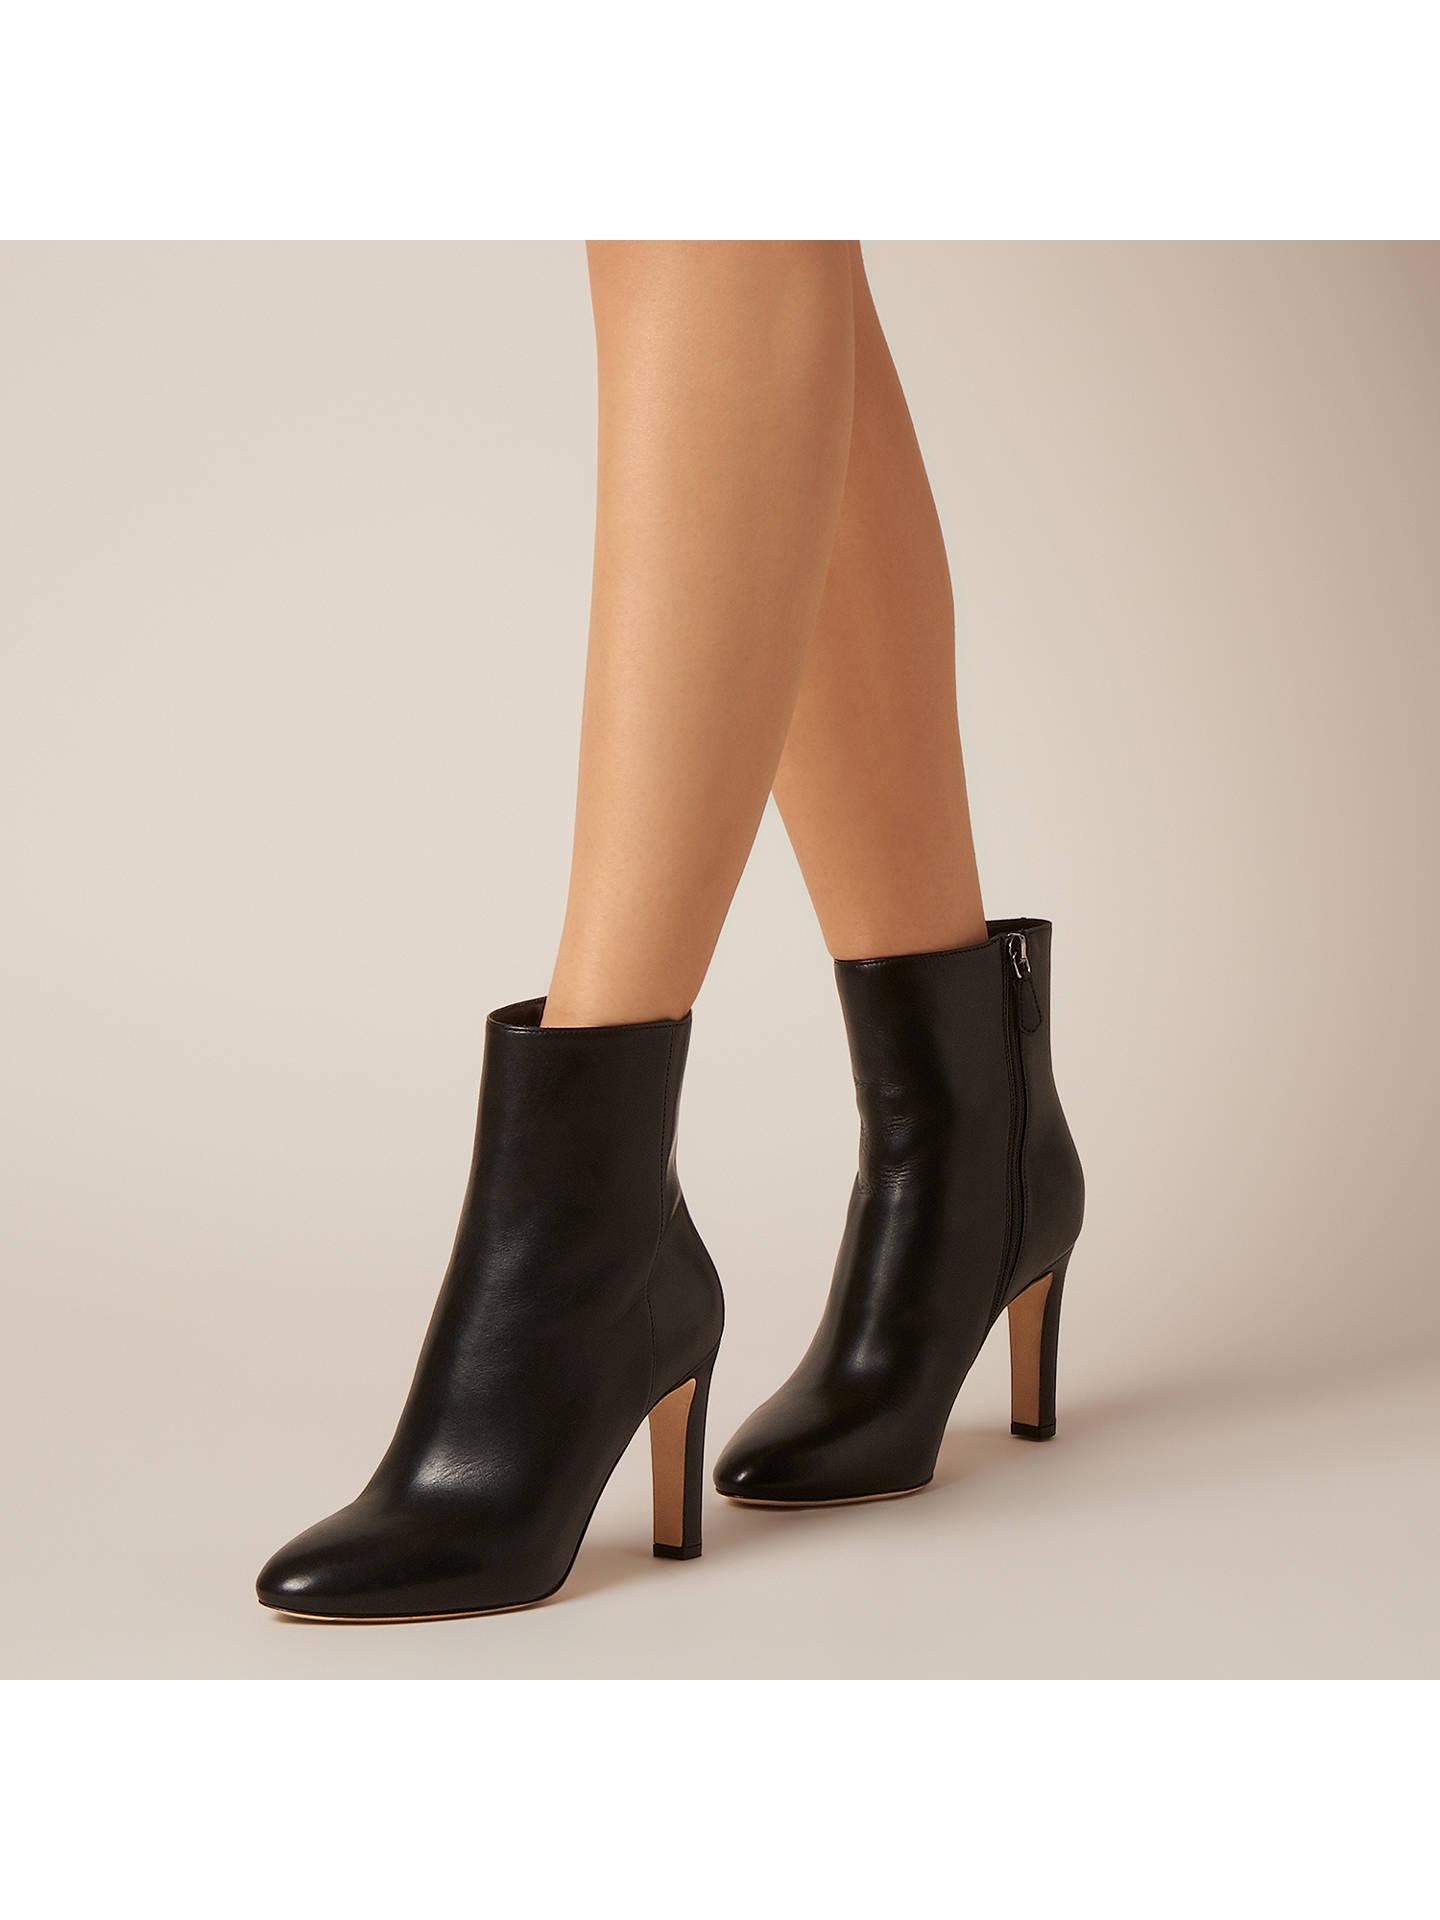 c01b204e3 ... Buy L.K.Bennett Edelle Block Heeled Ankle Boots, Black Leather, 2  Online at johnlewis ...